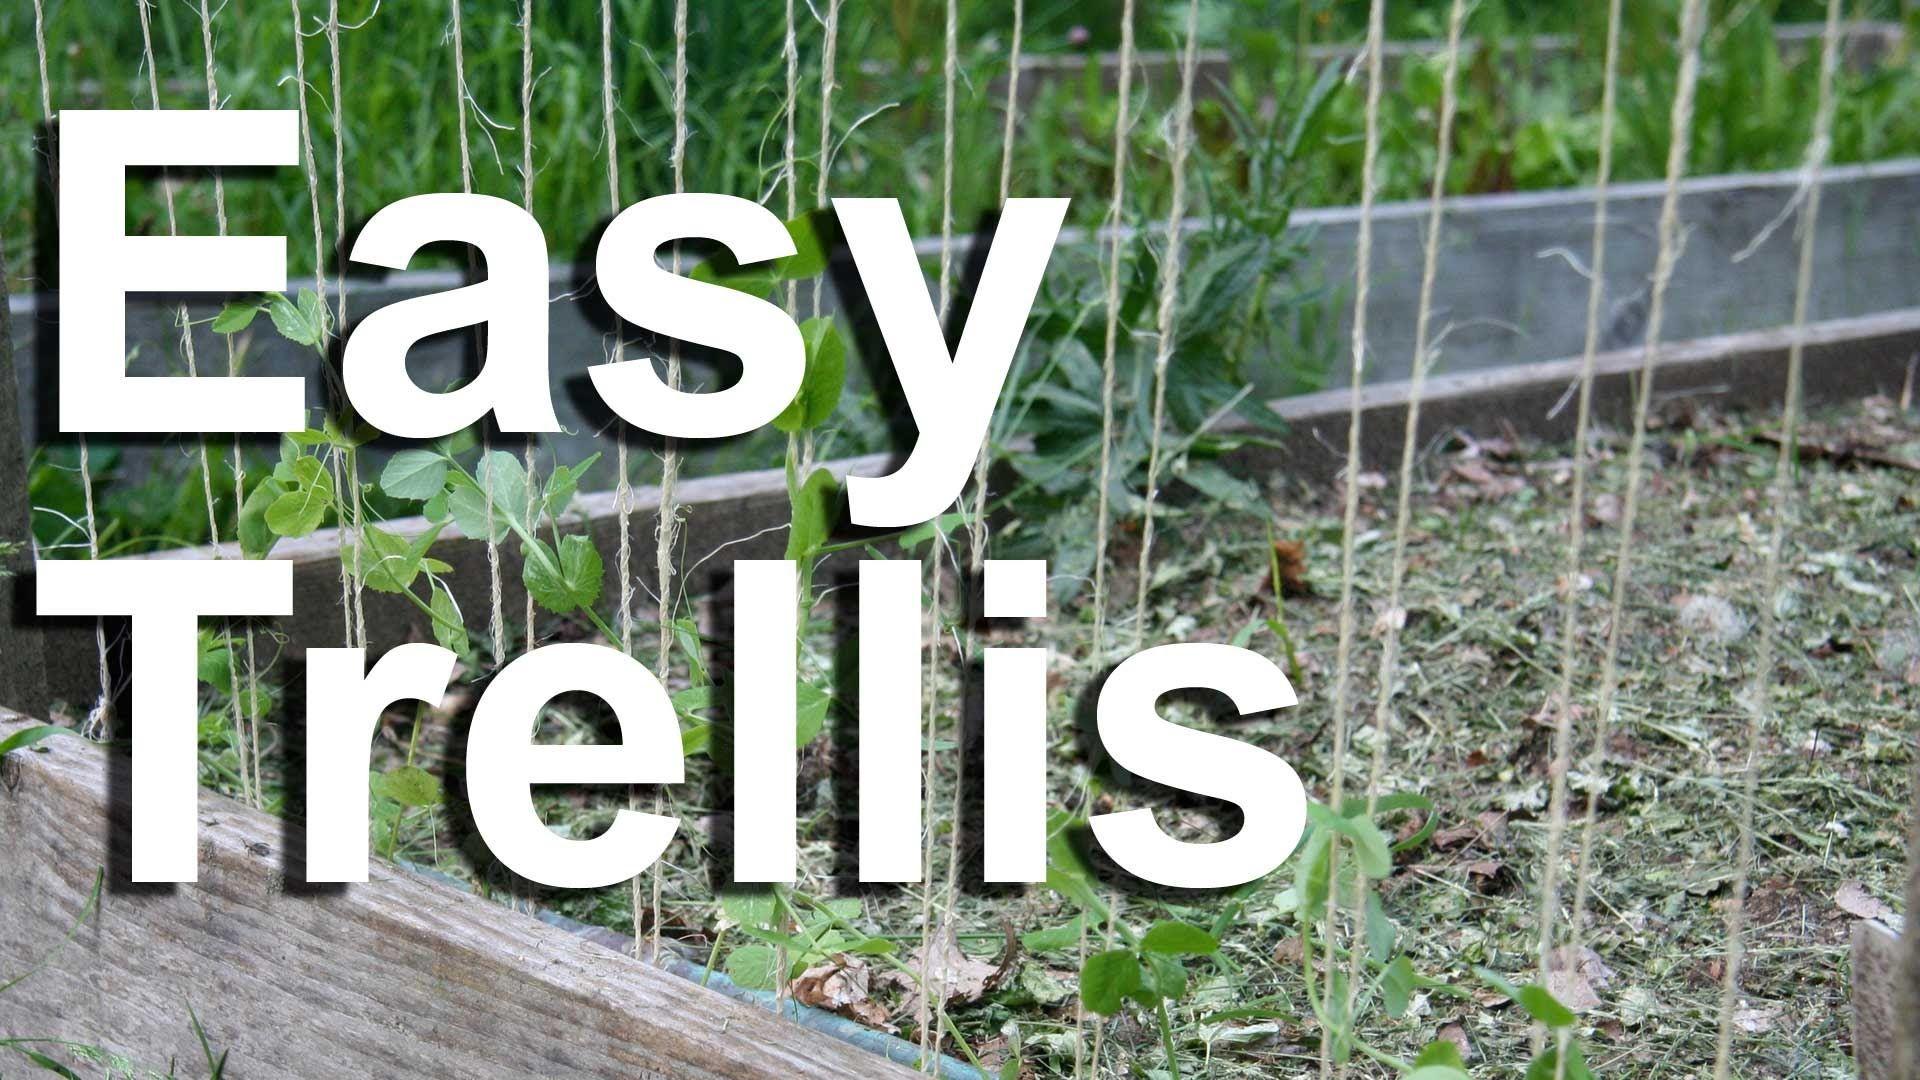 Nice Climbing Vine Trellis Ideas Part - 11: Tv: Build A Trellis For Your Vegetables, Vines Garden Or Climbing Plants Is  Easy. Watch This DIY Video To Make A Garden Trellis. Plans For.